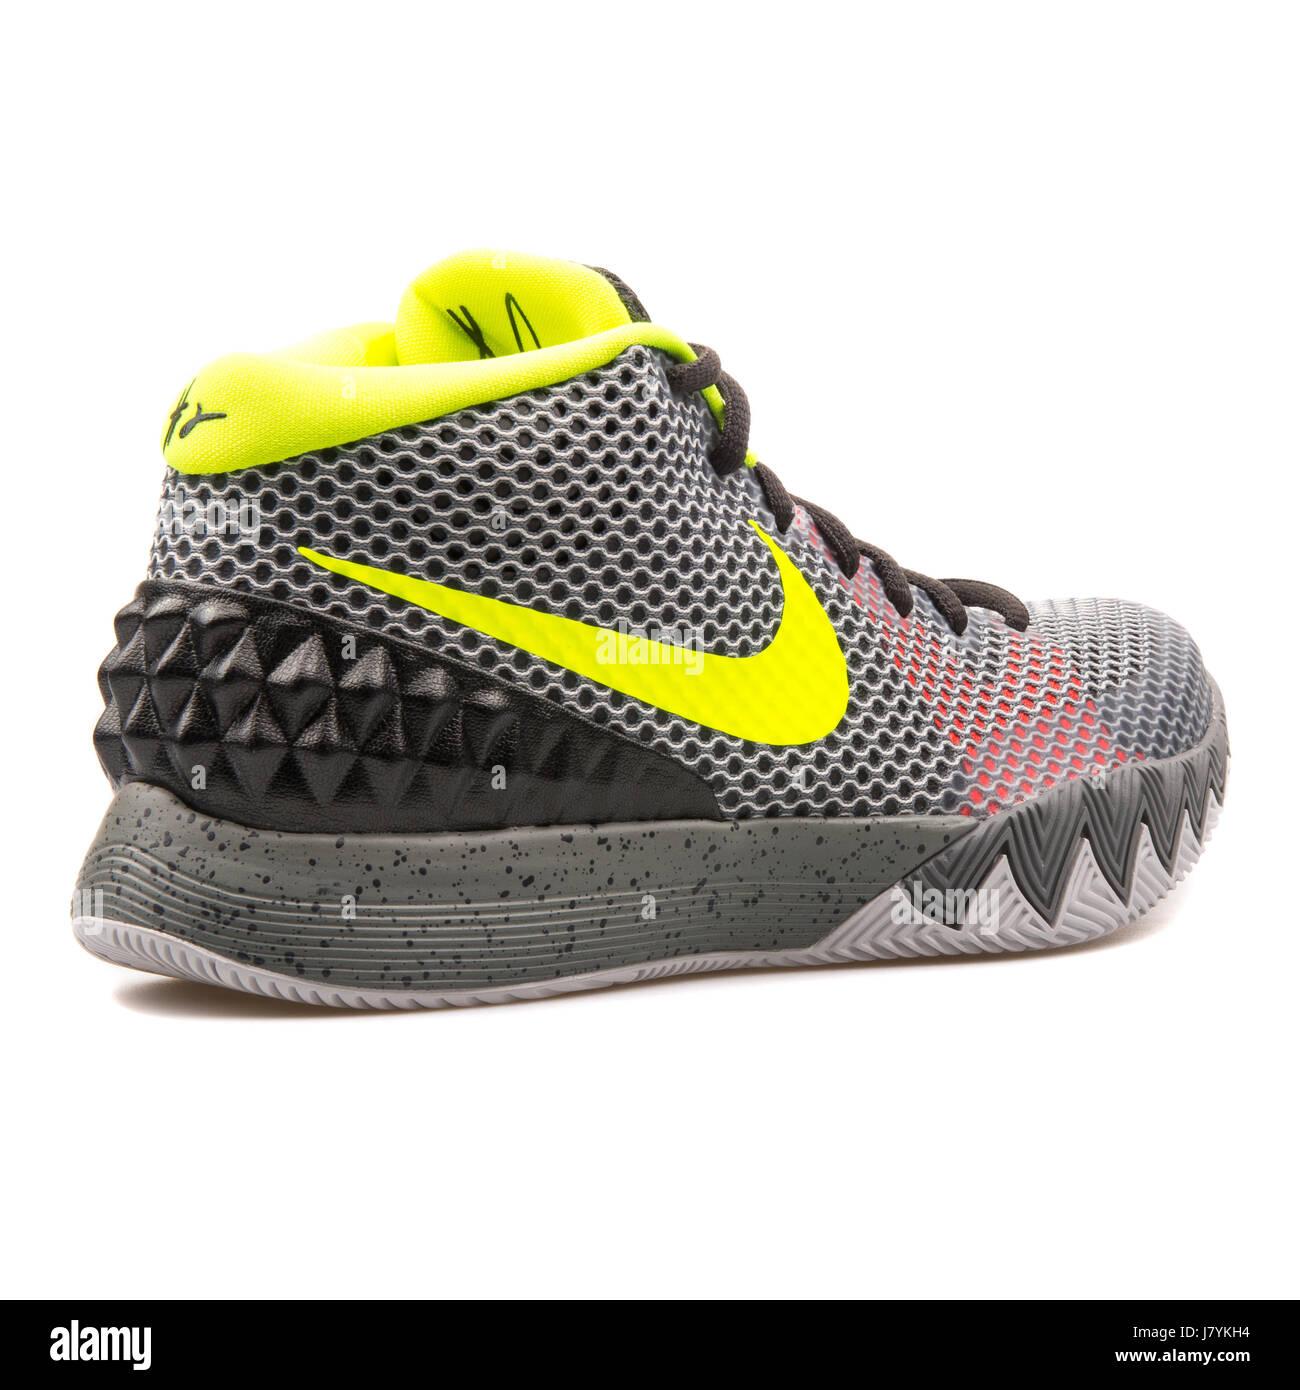 7a063799b1d95 Nike Kyrie 1 hombres gris zapatillas de baloncesto - 705277-270 Foto ...